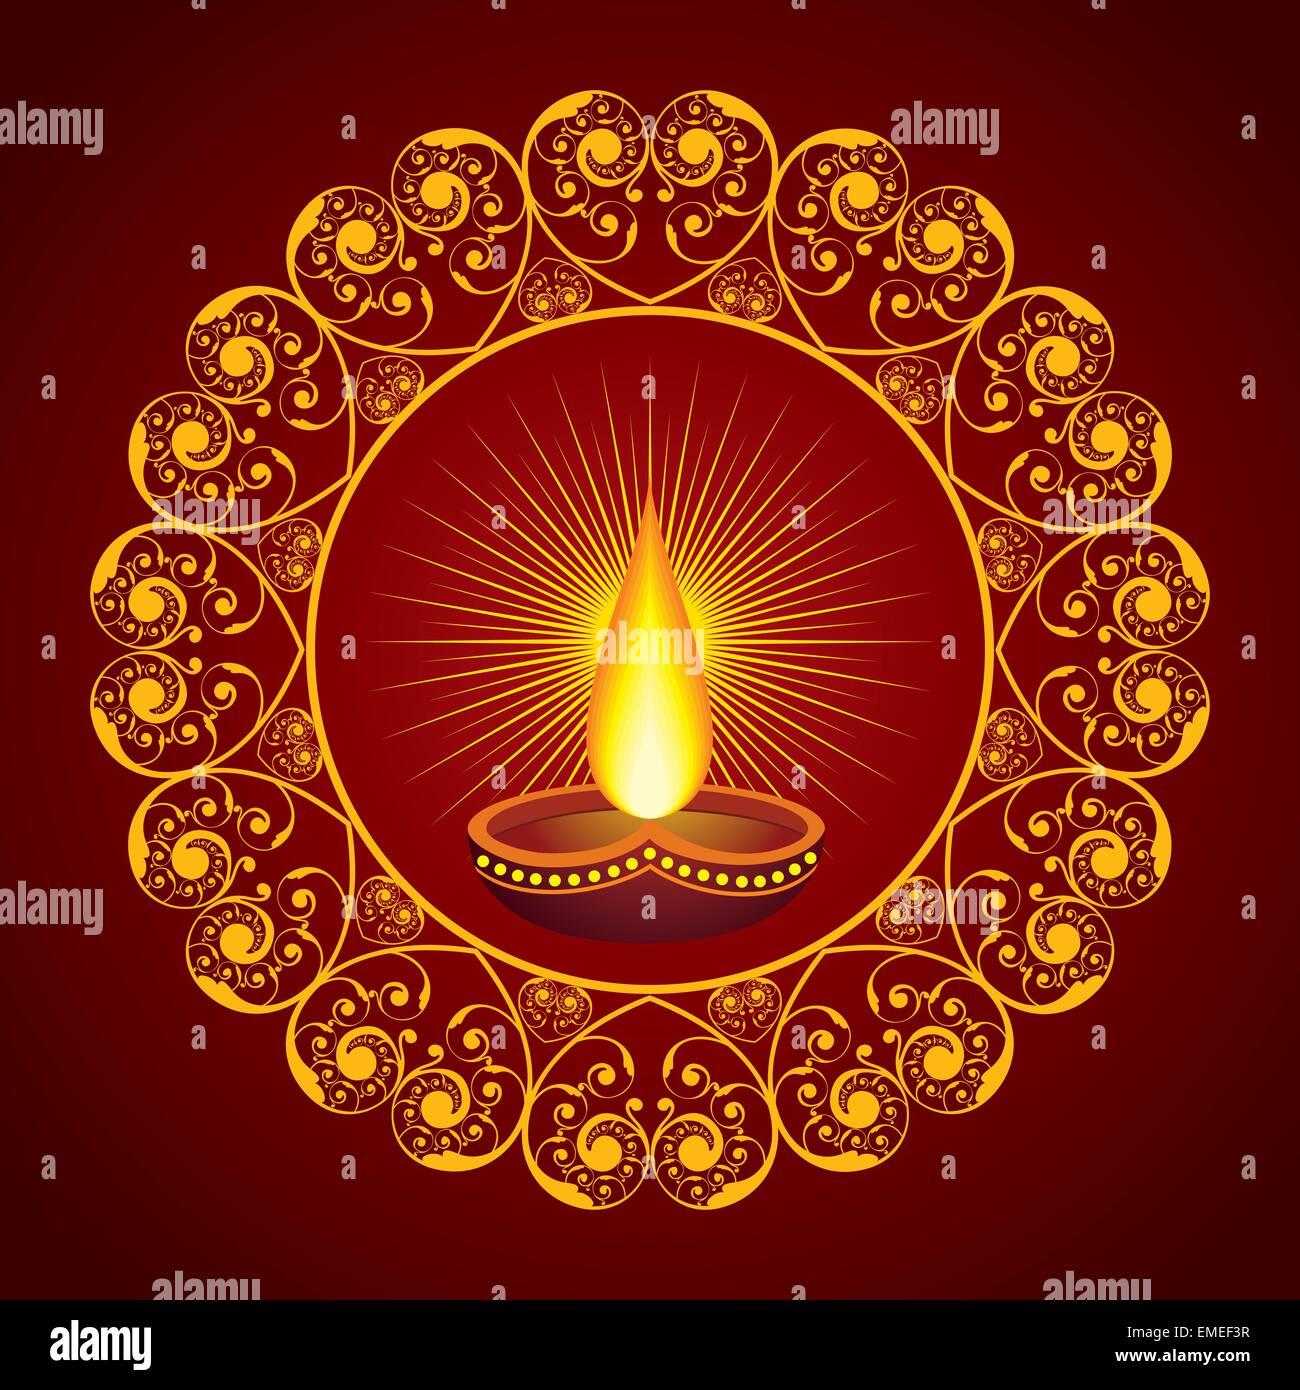 Creative Diwali Greeting Vector Illustration Stock Photos Creative